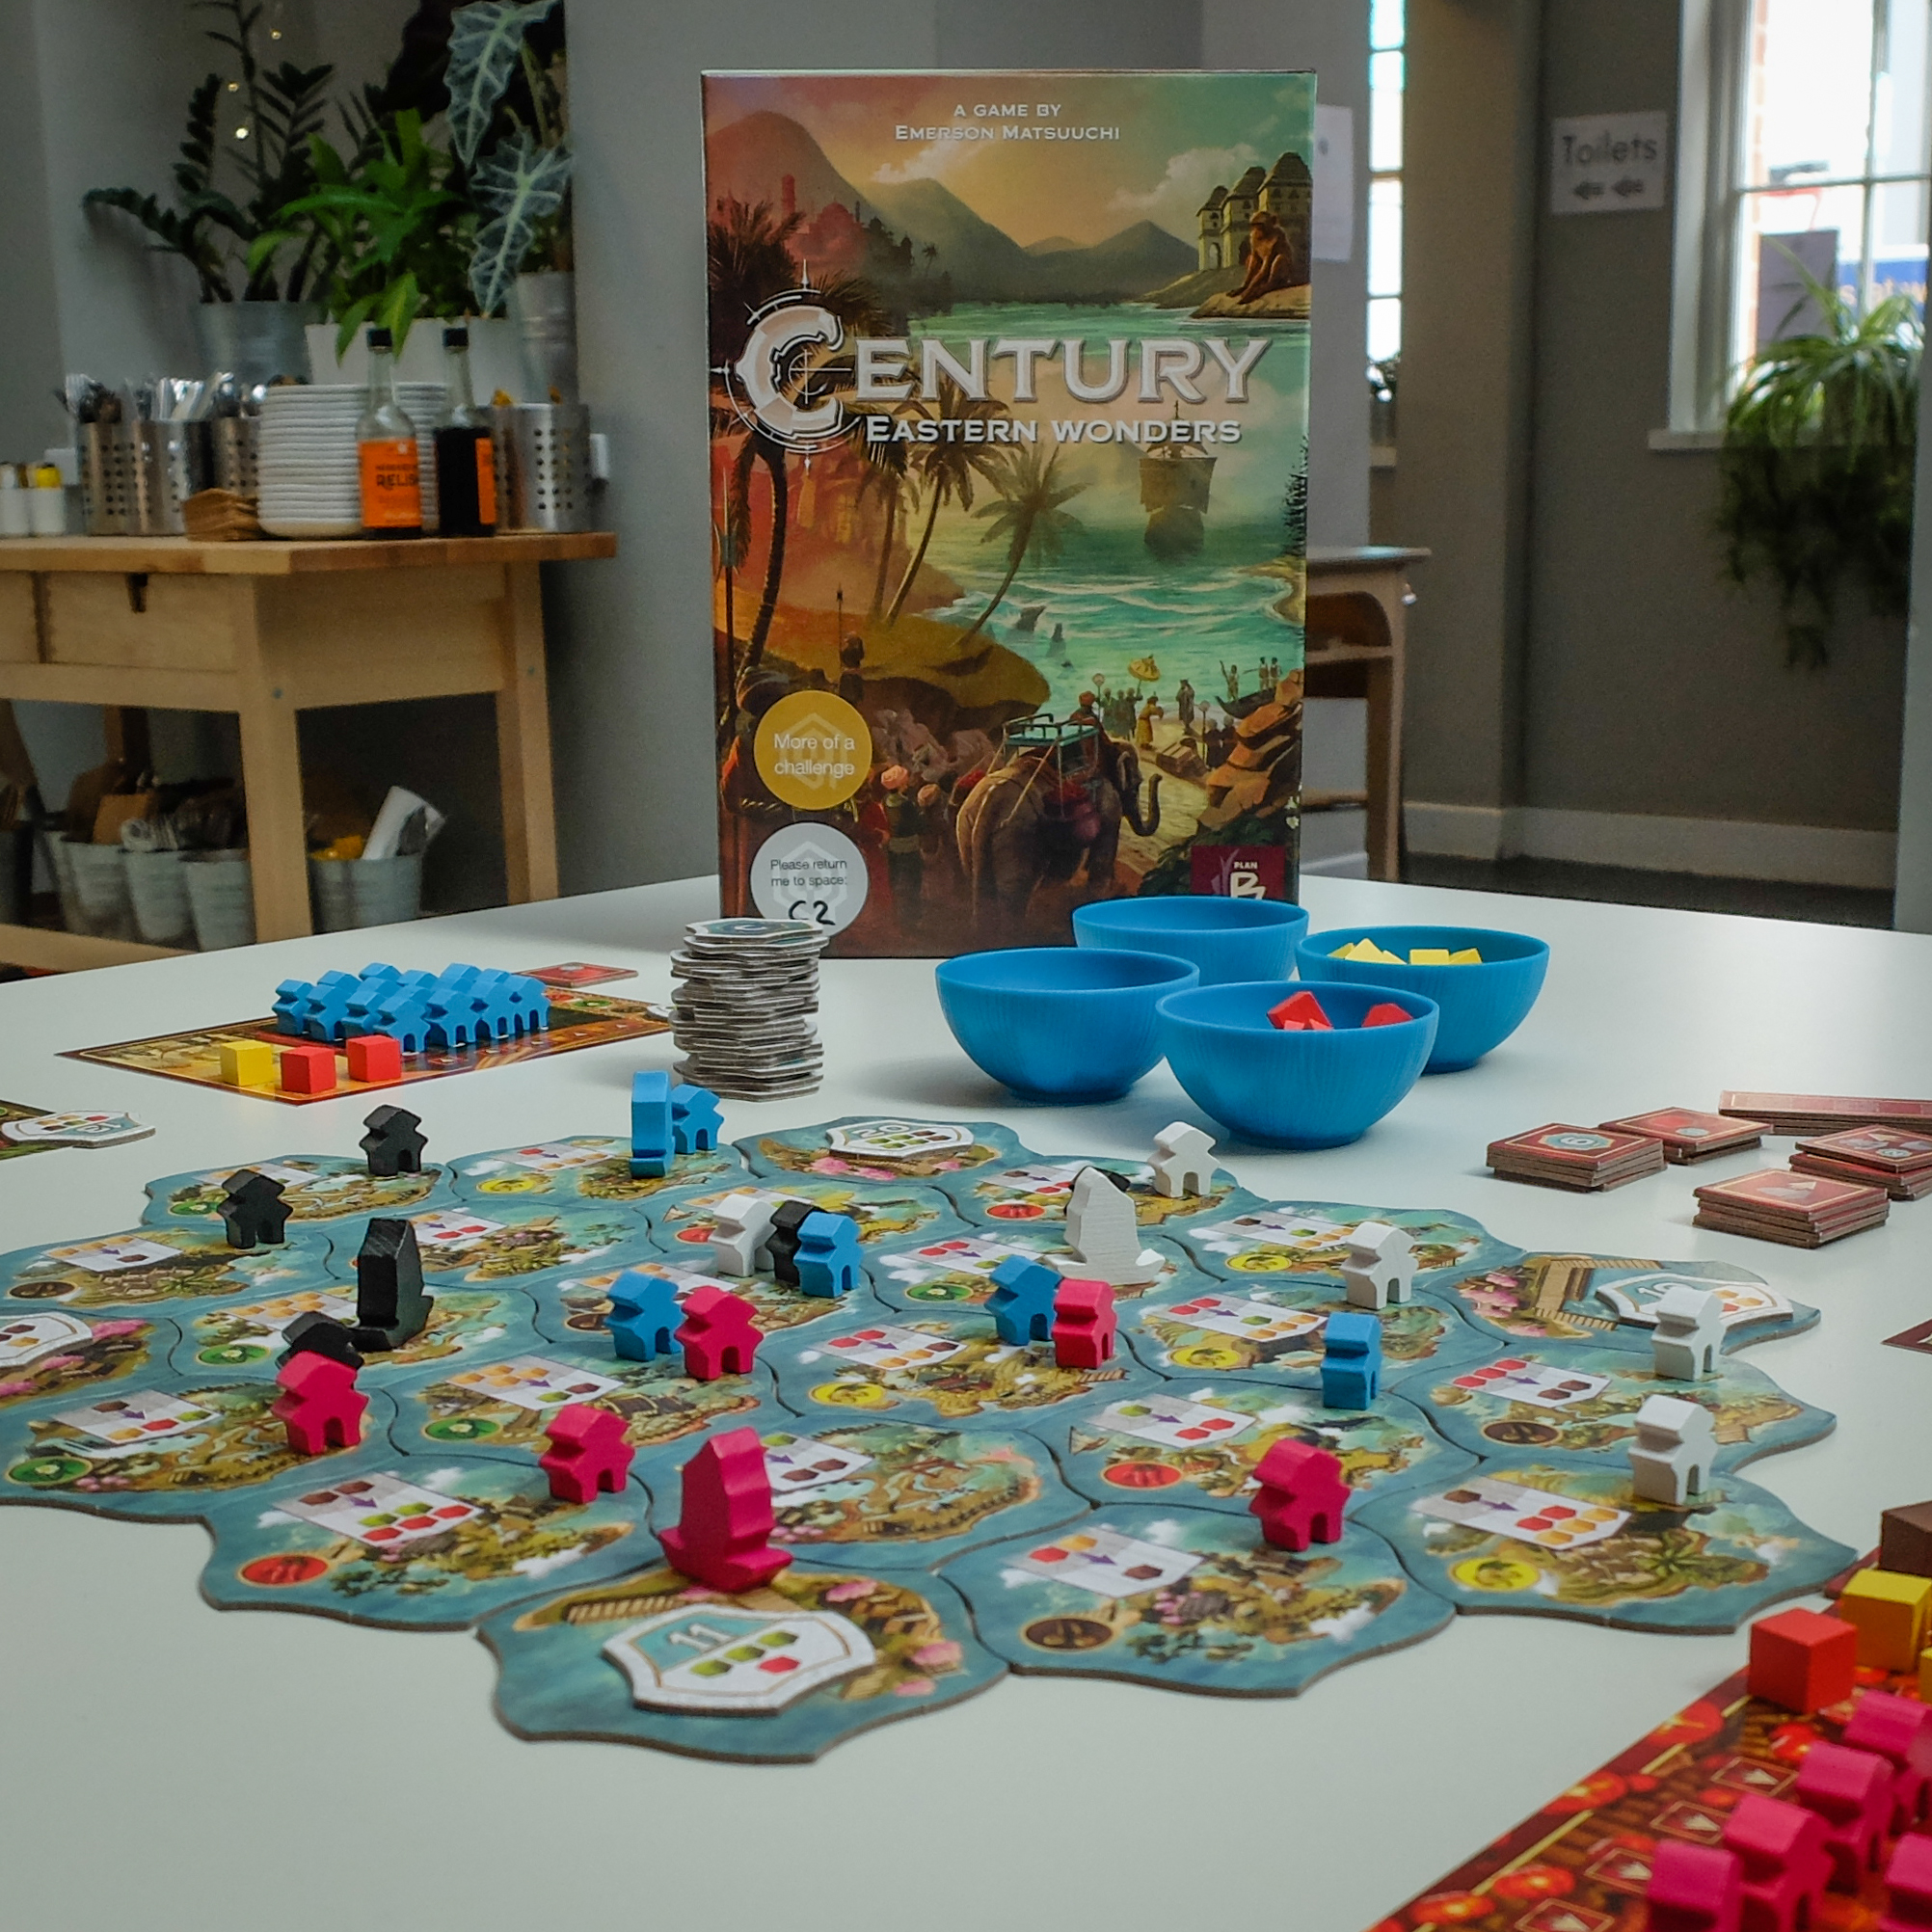 Century: Eastern Wonders in all its glory